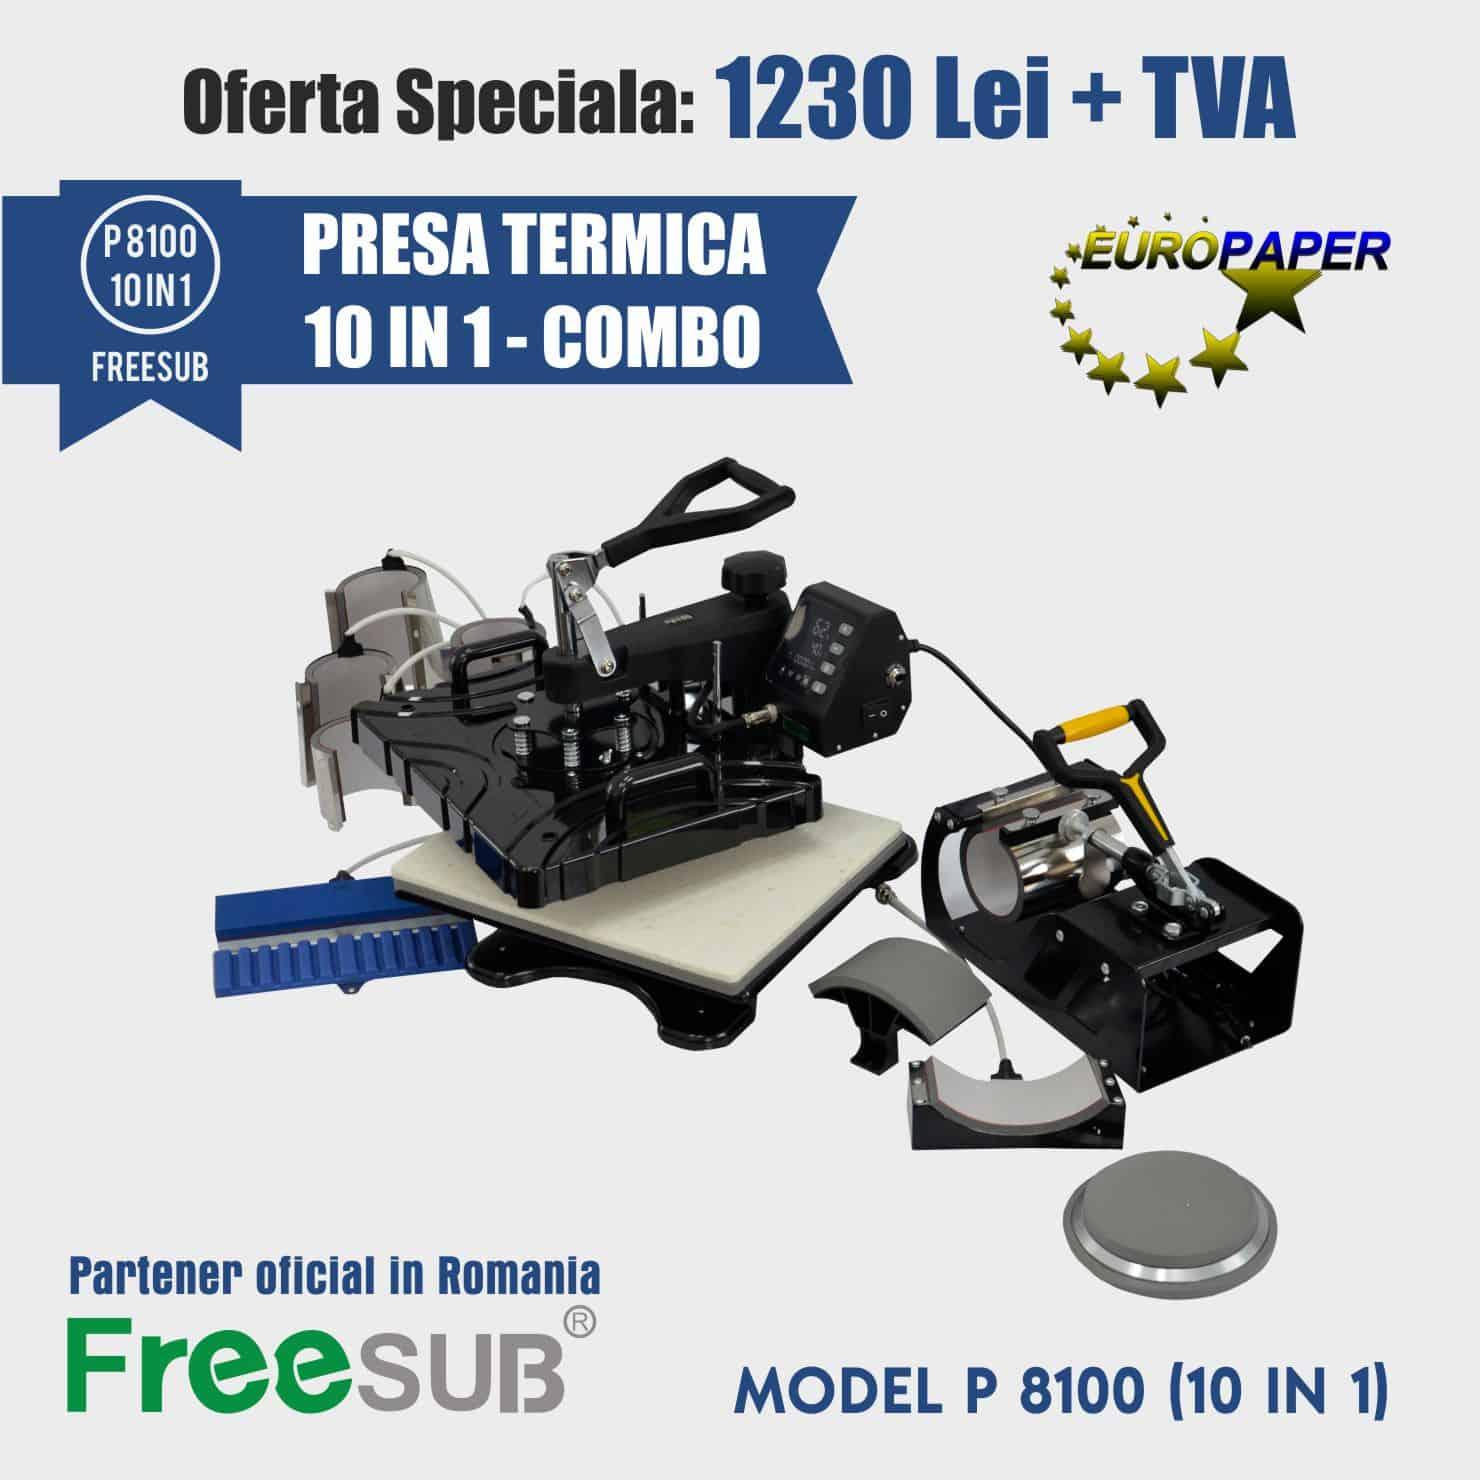 FREESUB P8100 COMBO